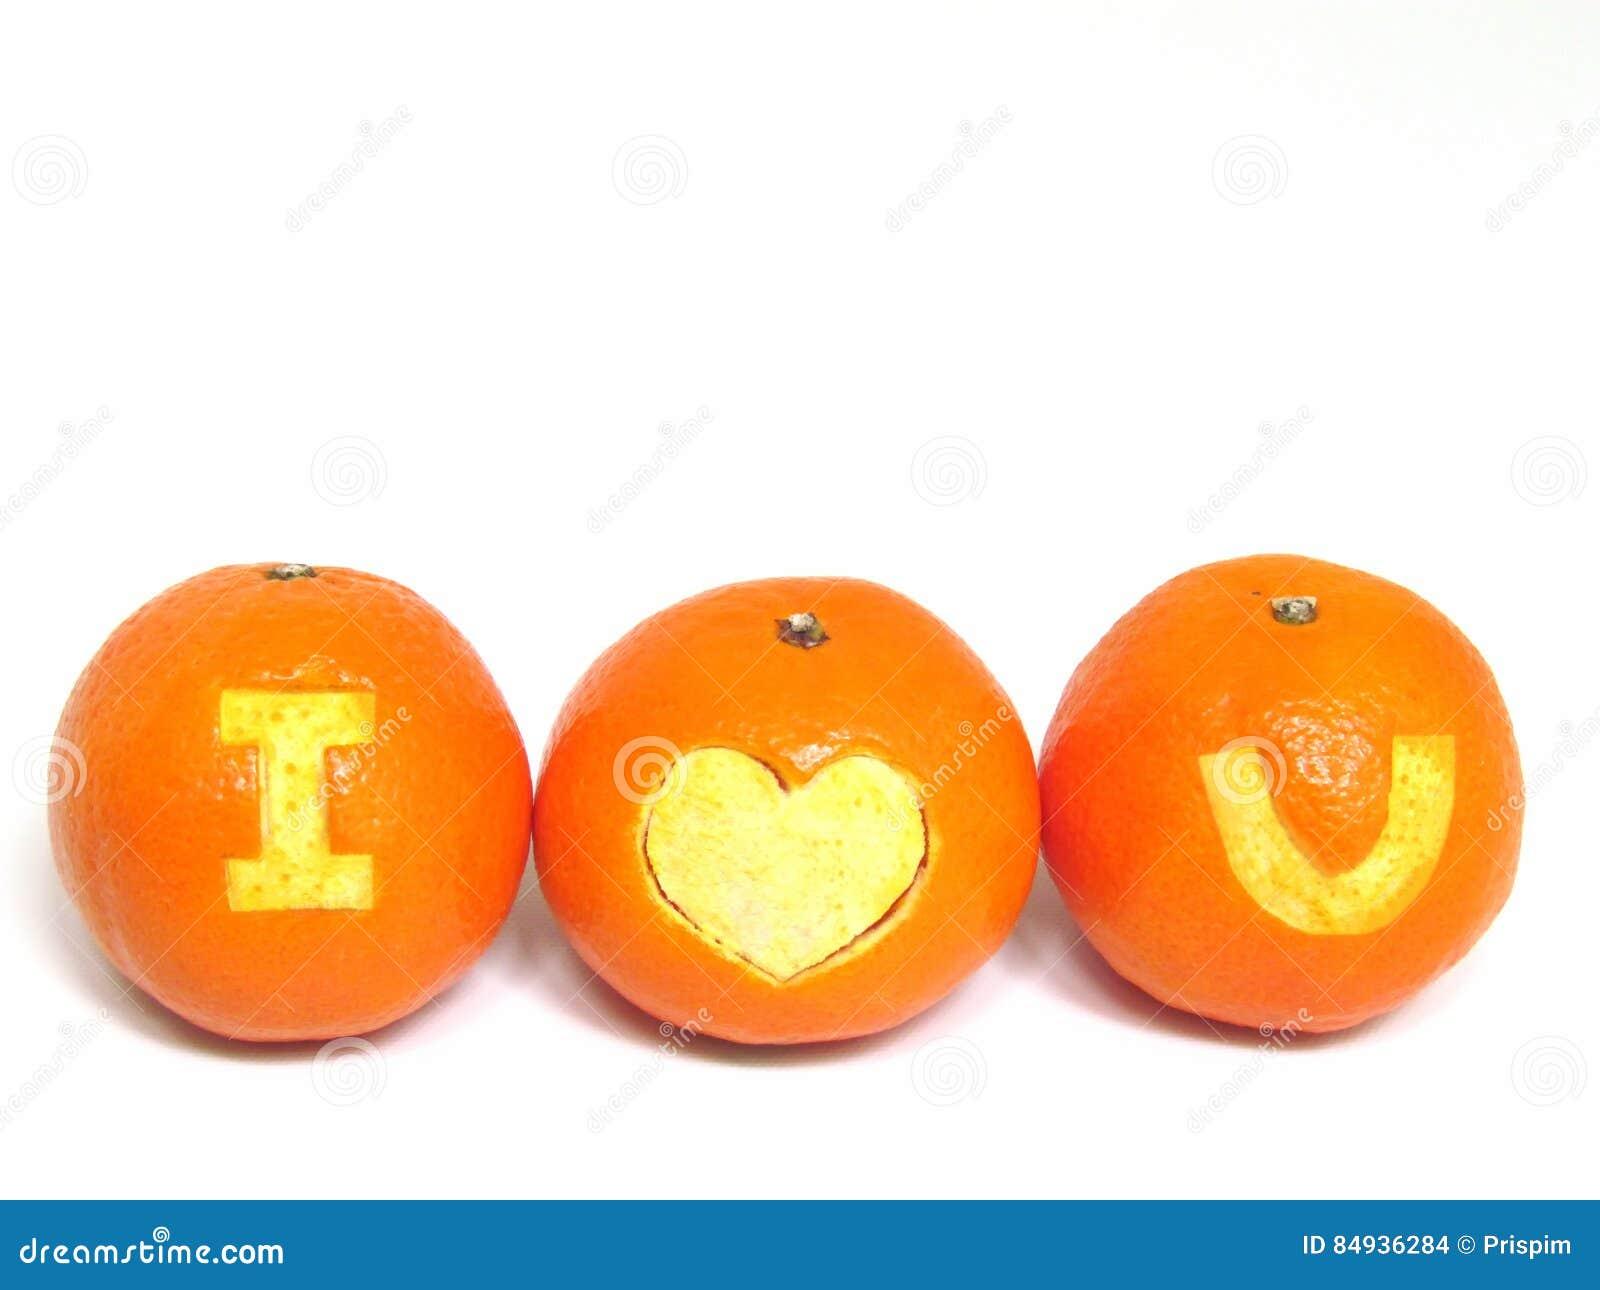 Orange fruits healthy organic oranges with symbol i love u royalty free stock photo biocorpaavc